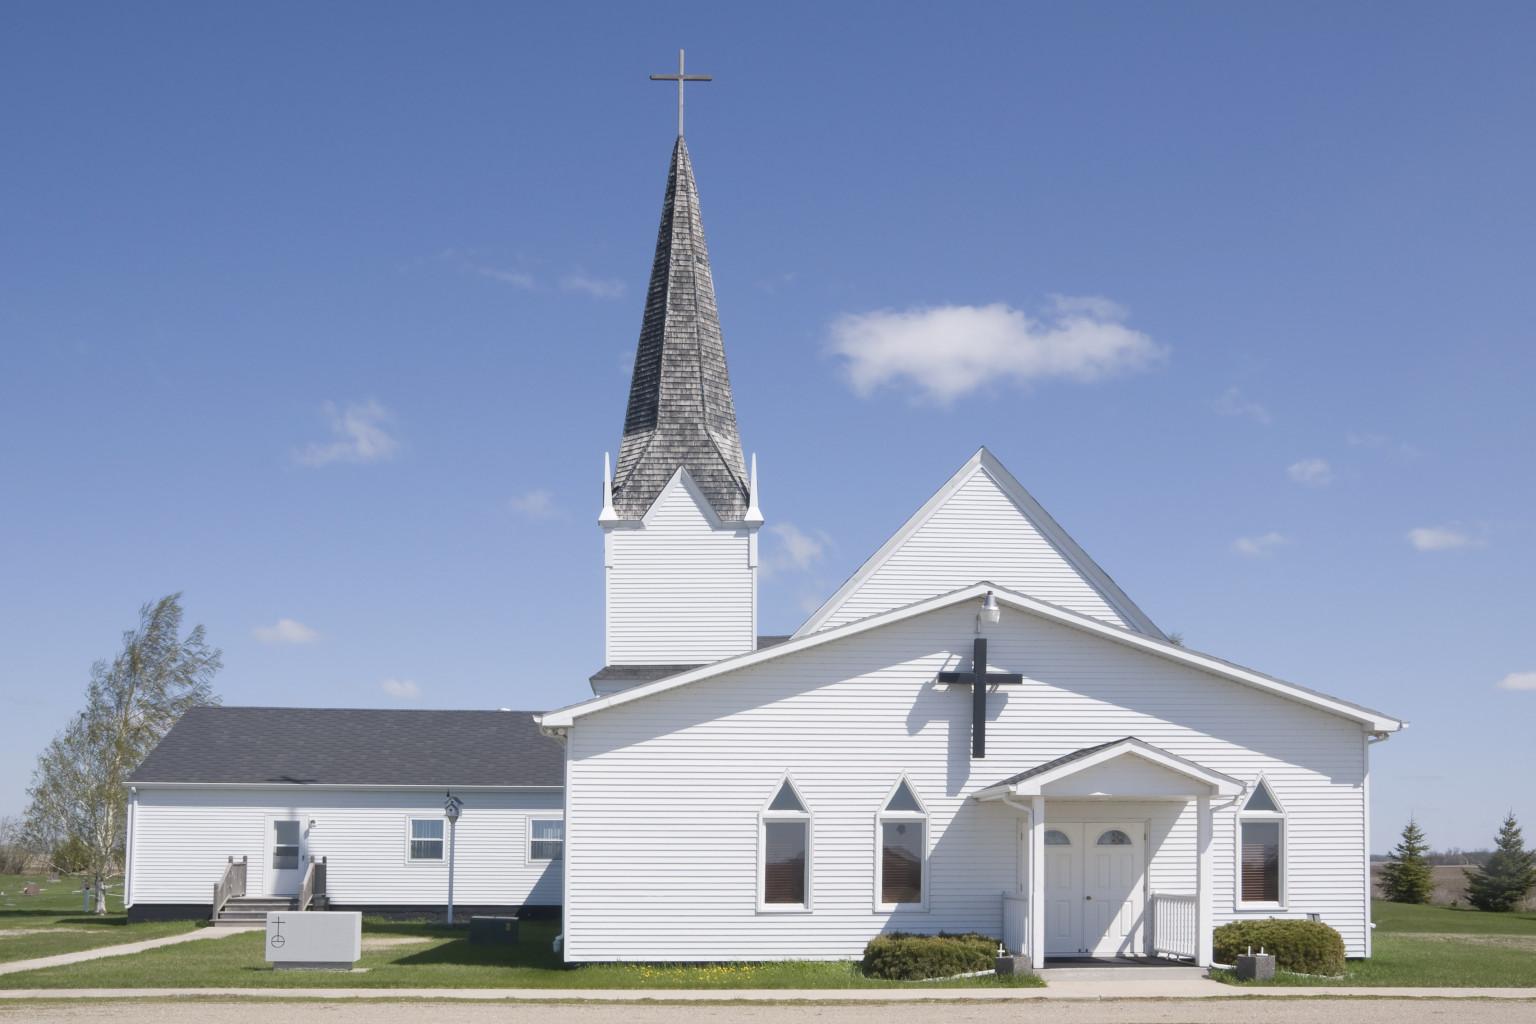 white supremacy  evangelicals  and mississippi u0026 39 s 1964